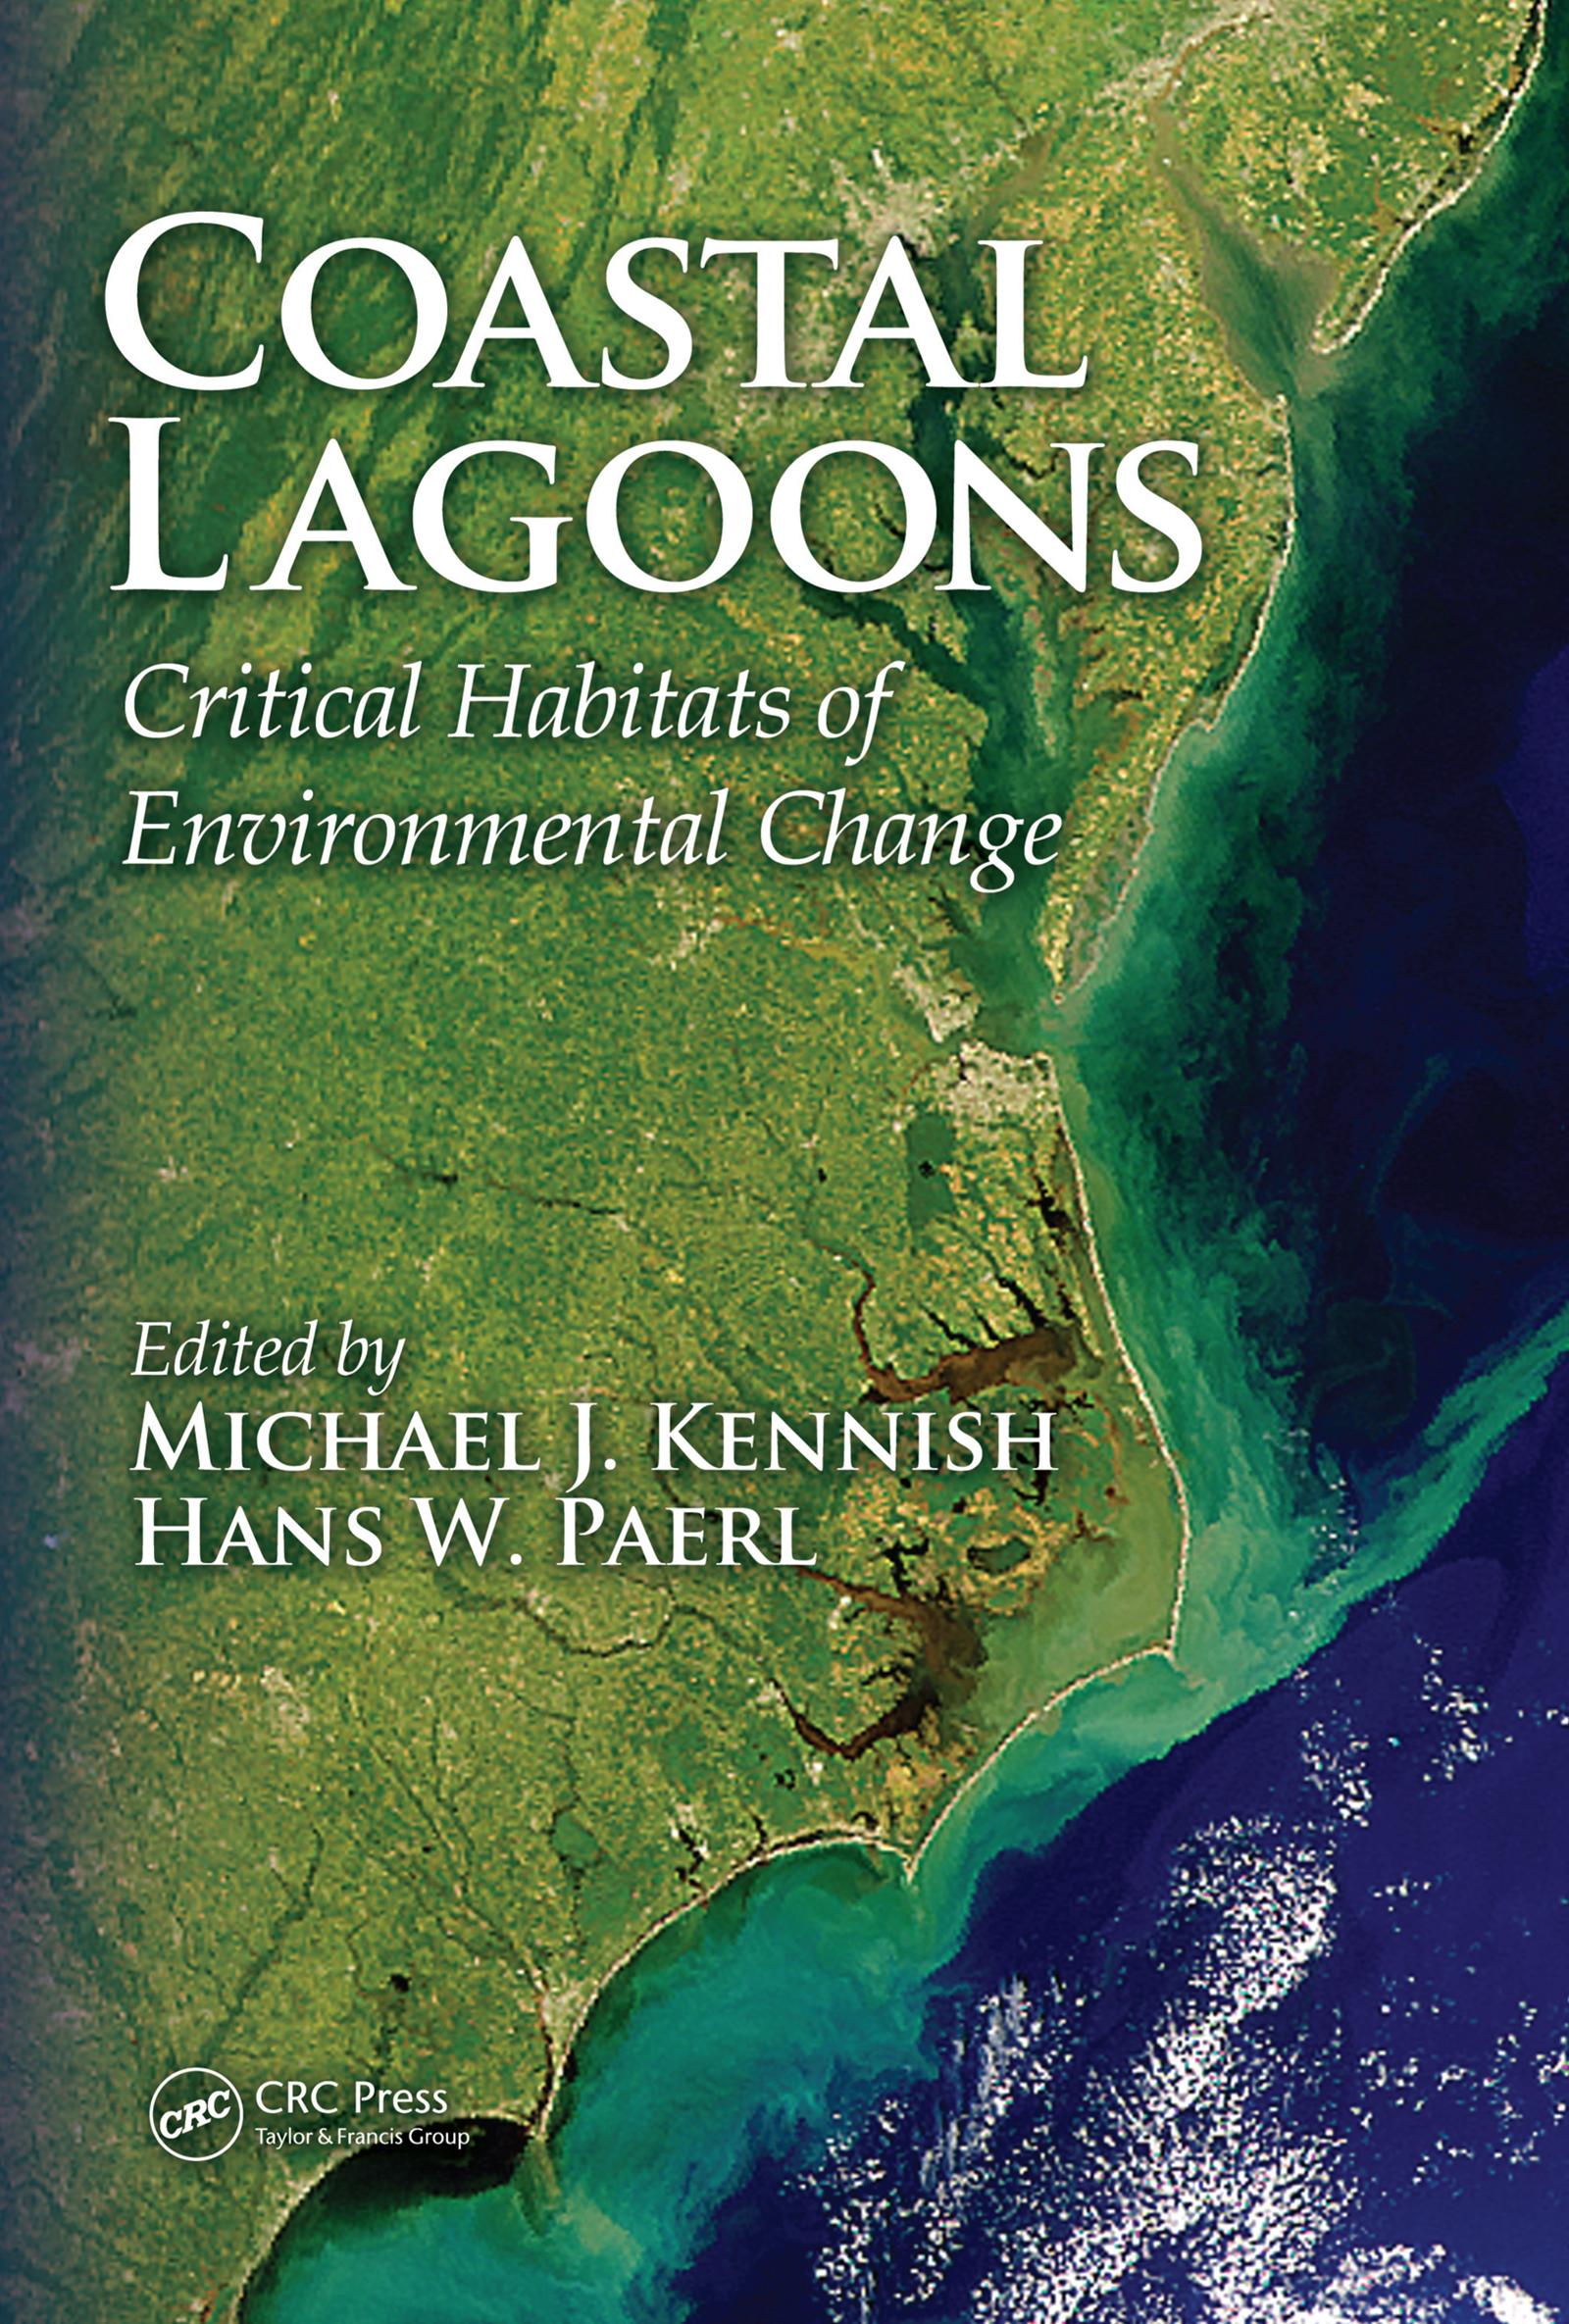 1Chapter 3 Subtropical Karstic Coastal Lagoon Assessment, Southeast Mexico: The Yucatan Peninsula Case